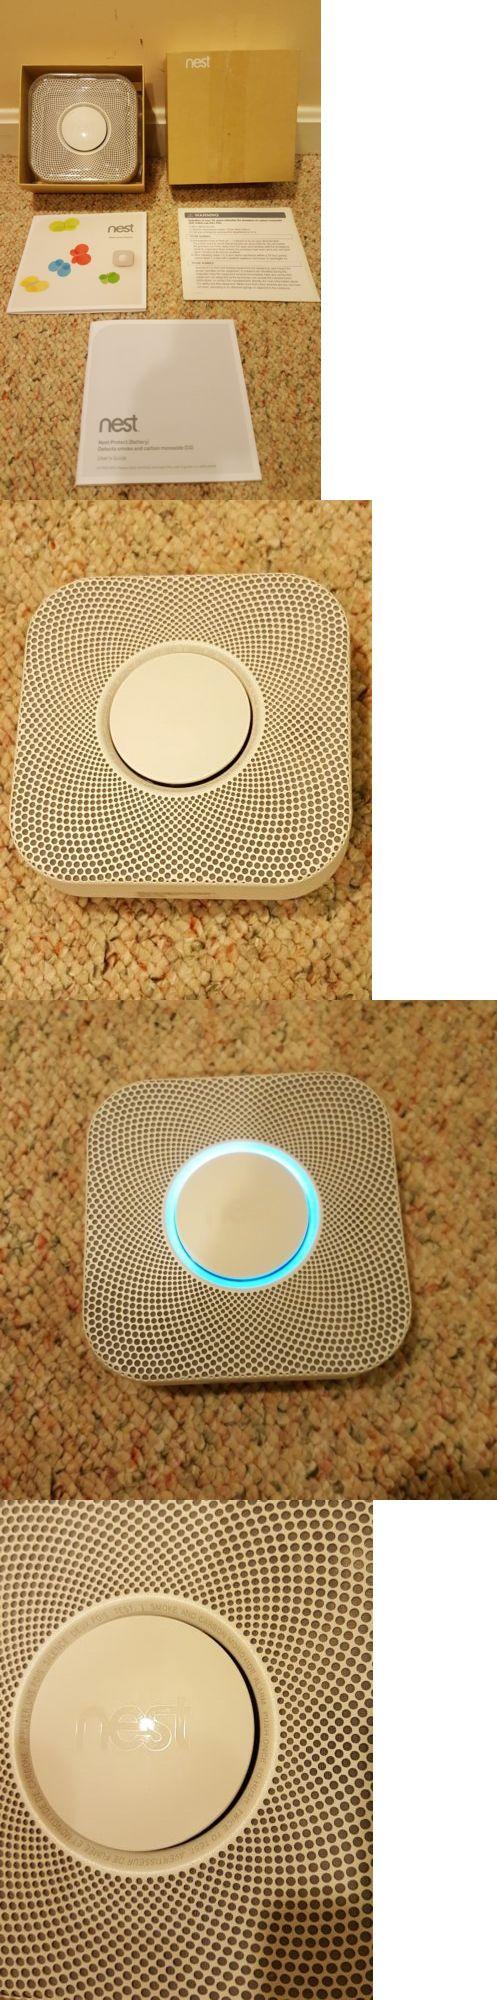 Smoke Detectors 115942: Nest Protect 2Nd Generation (Battery) Smart Smoke Carbon Monoxide Alarm W Box -> BUY IT NOW ONLY: $99.99 on eBay!